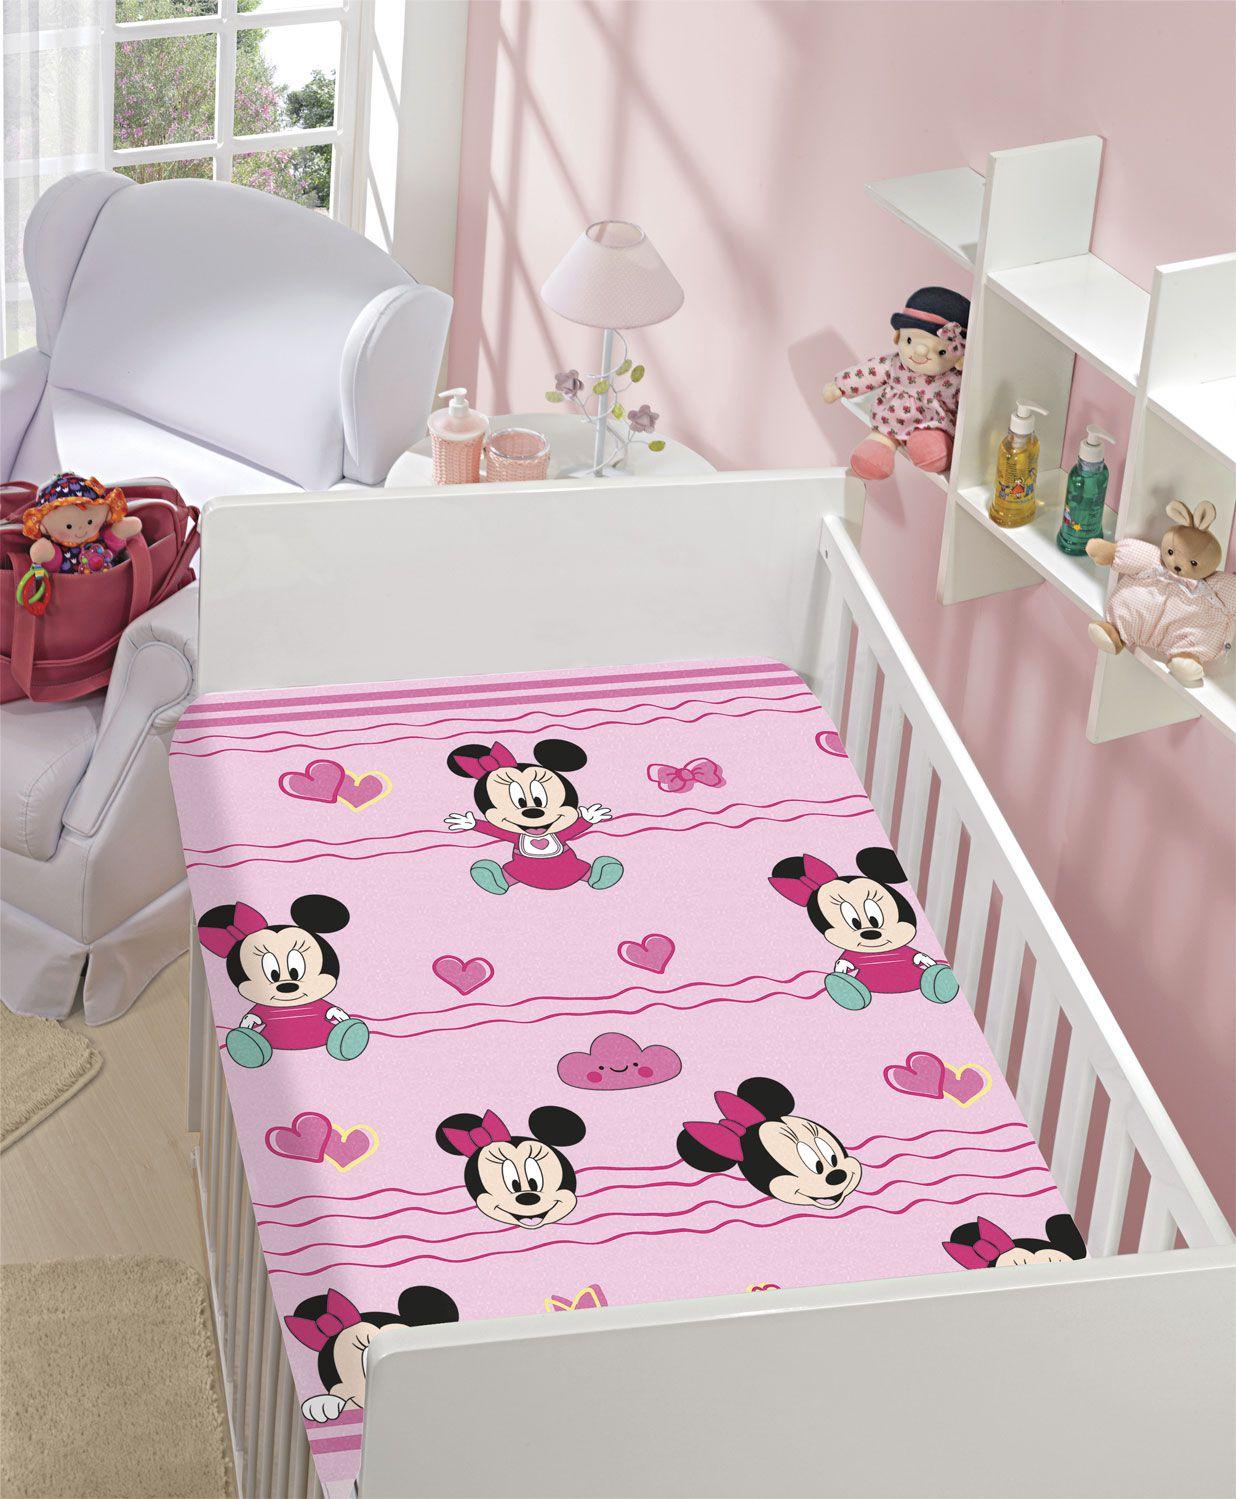 Manta Minnie Disney Baby Microfibra com toque Soft Jolitex